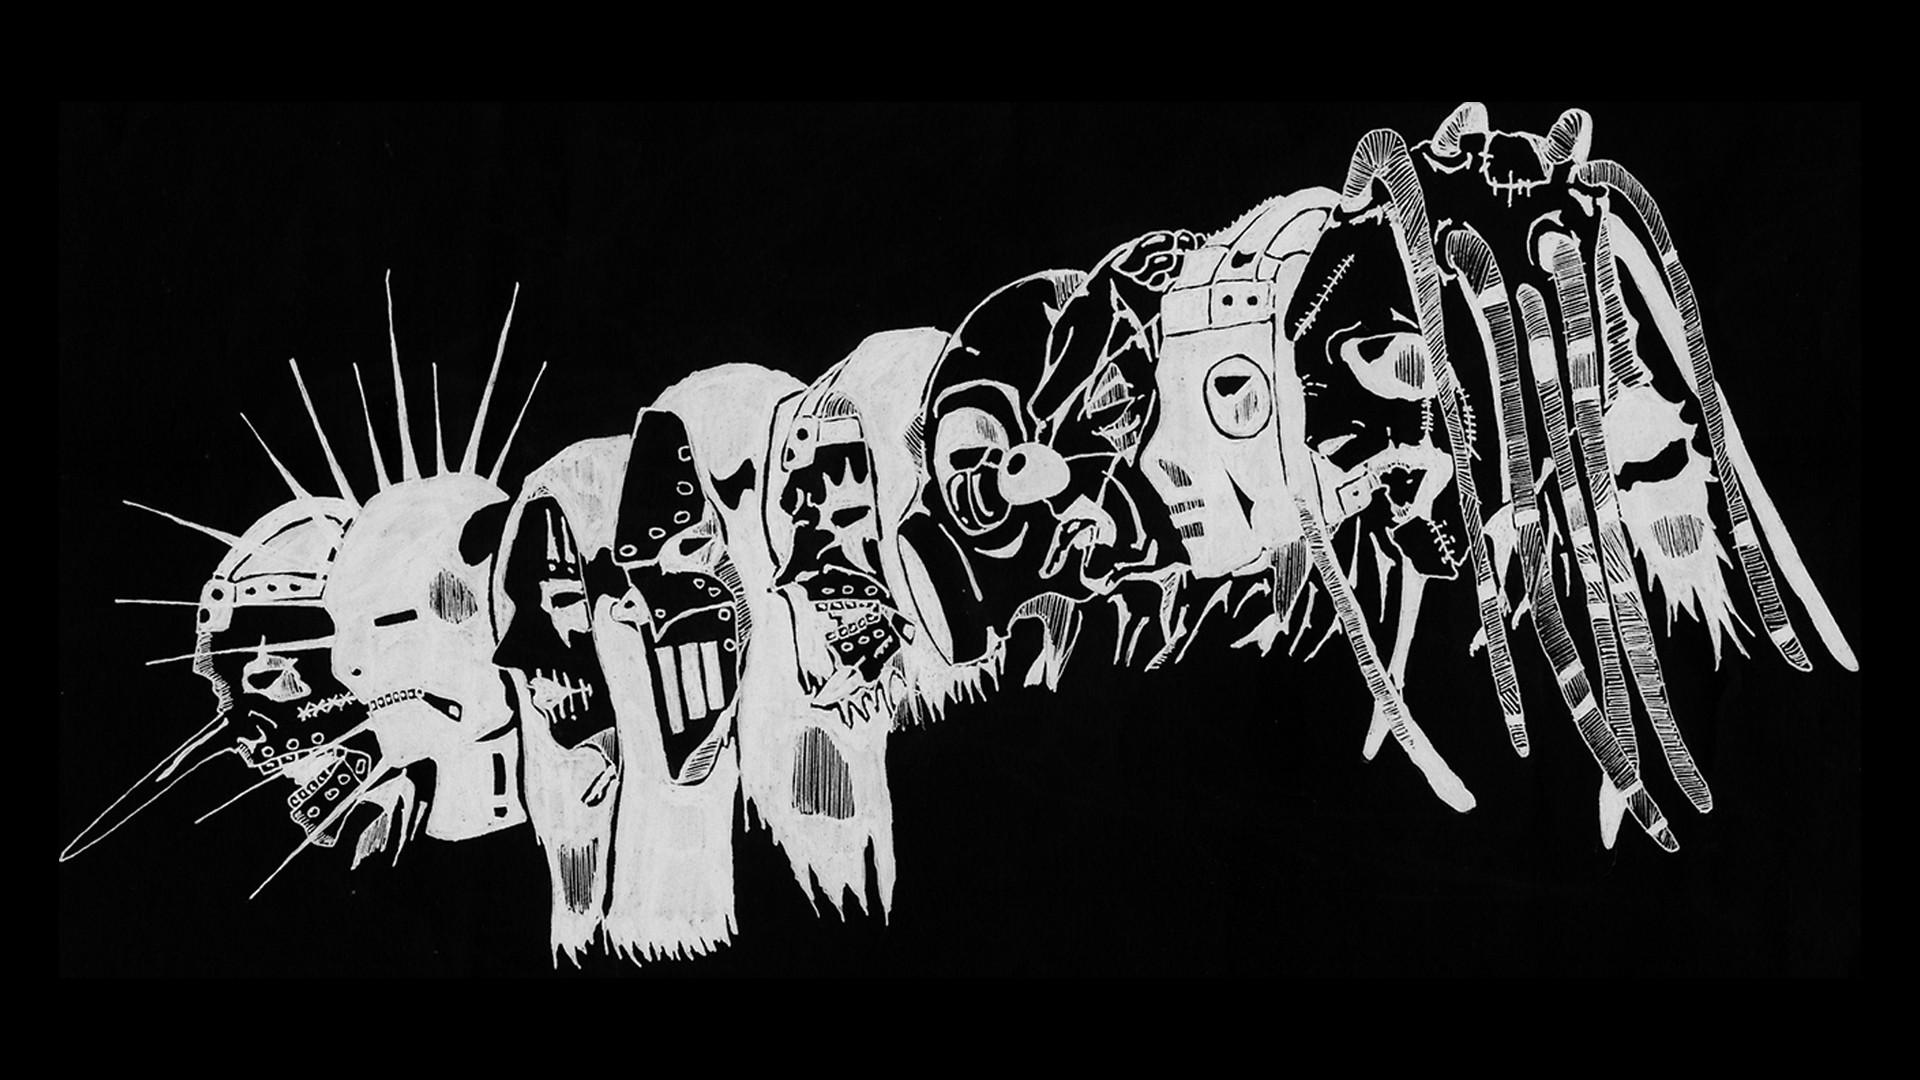 Slipknot full hd wallpaper and background image 1920x1080 id music slipknot dark heavy metal industrial metal nu metal wallpaper voltagebd Image collections